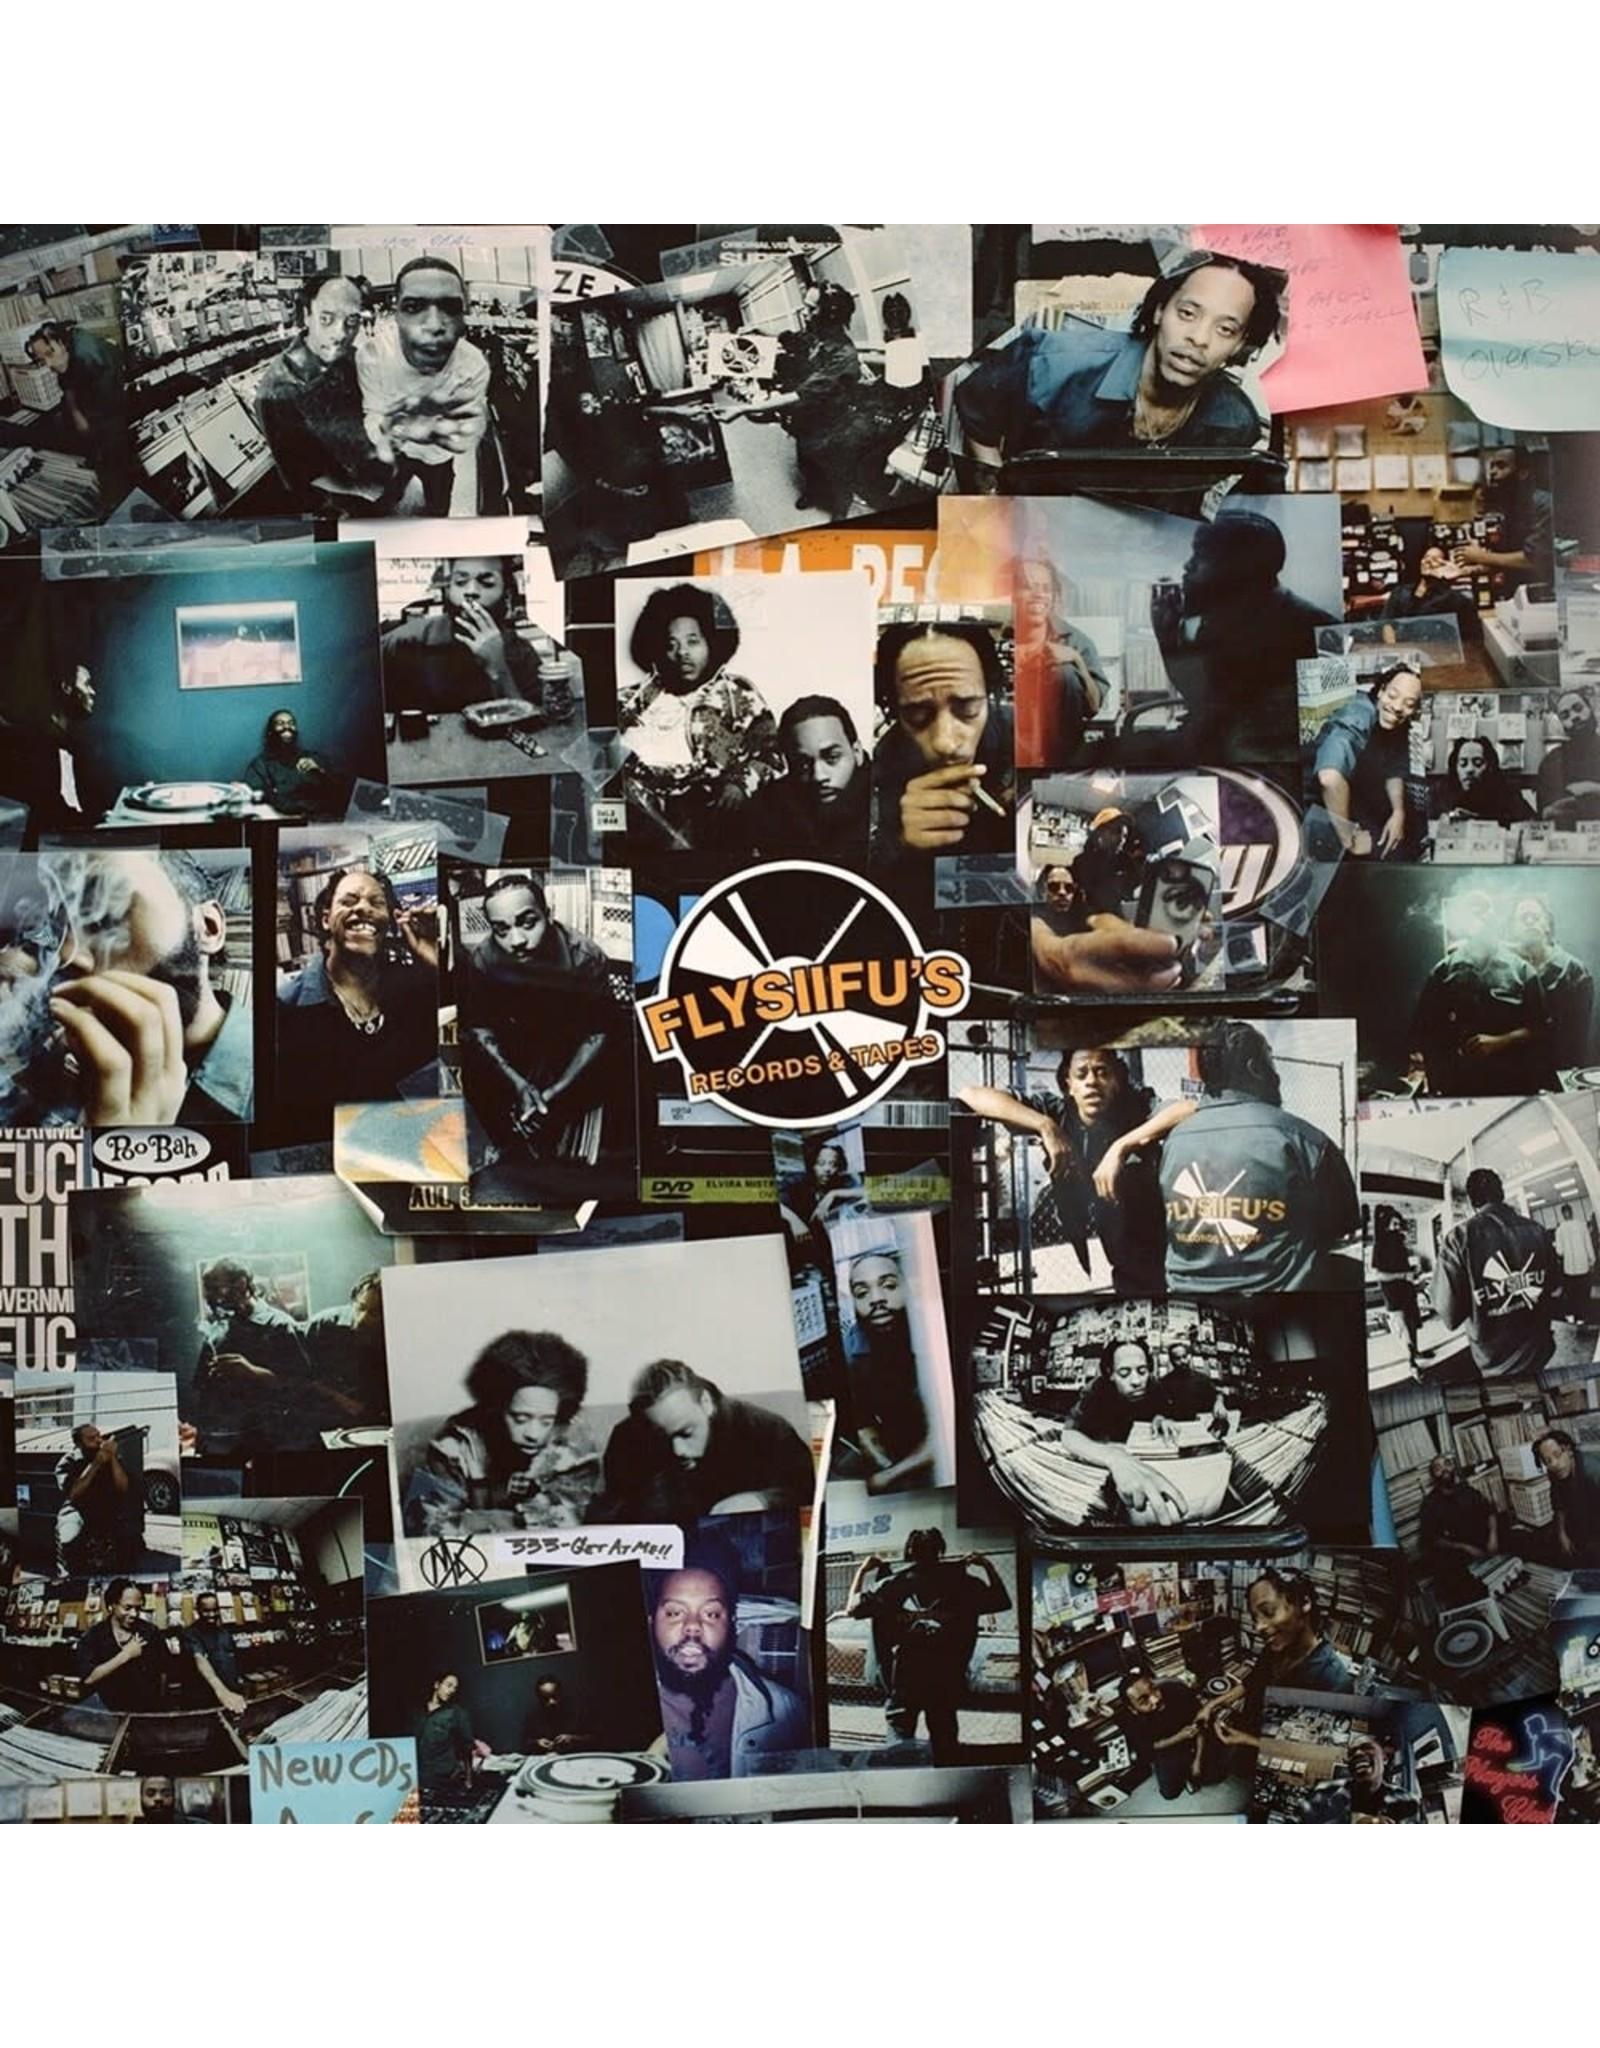 Pink Siifu & Fly Anakin - Flysiffu's Records & Tapes (orange vinyl) LP